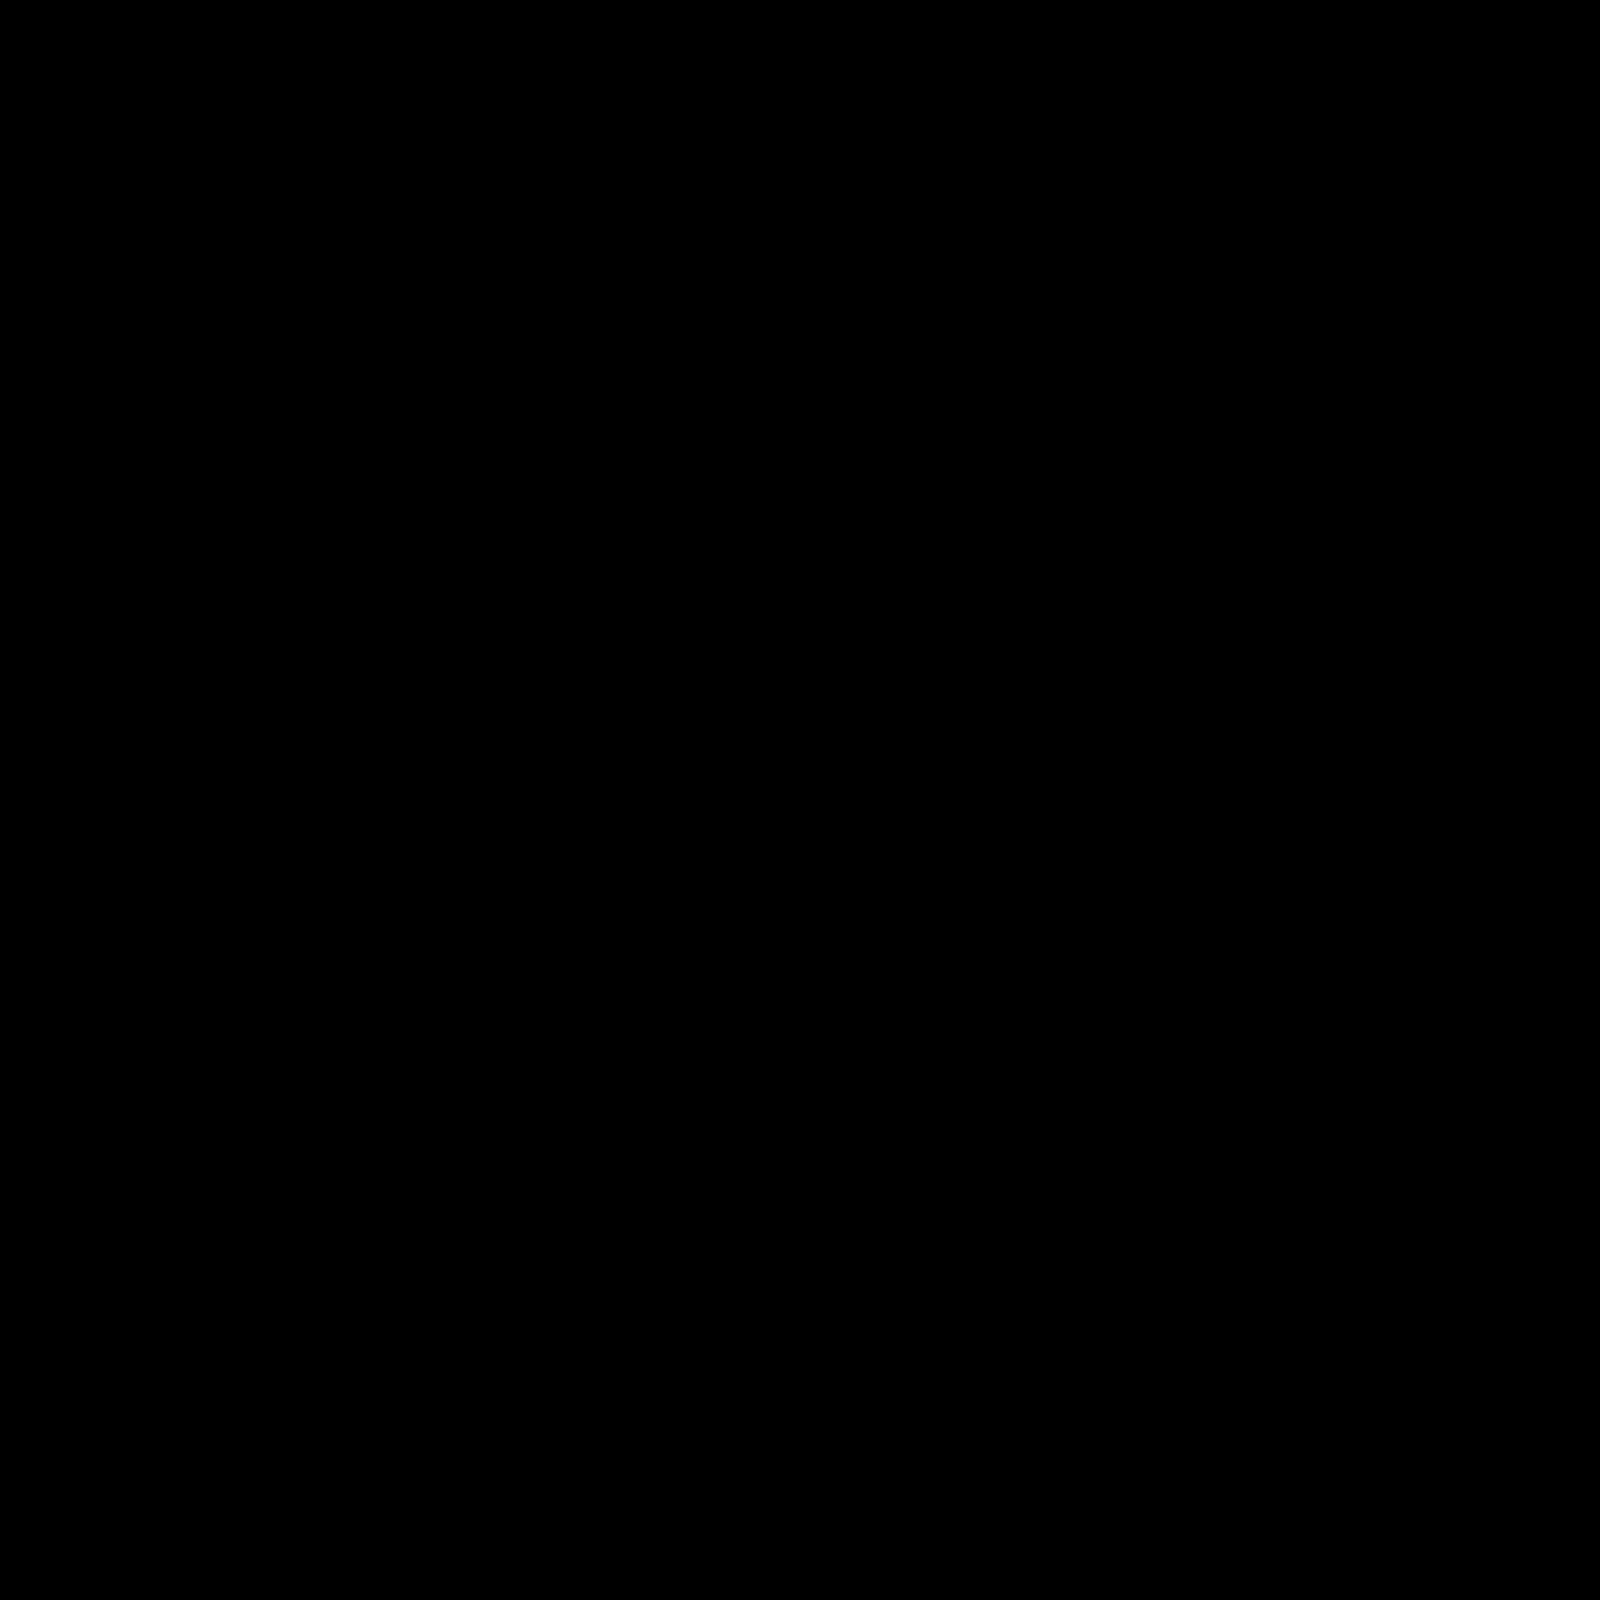 Objet urgent icon